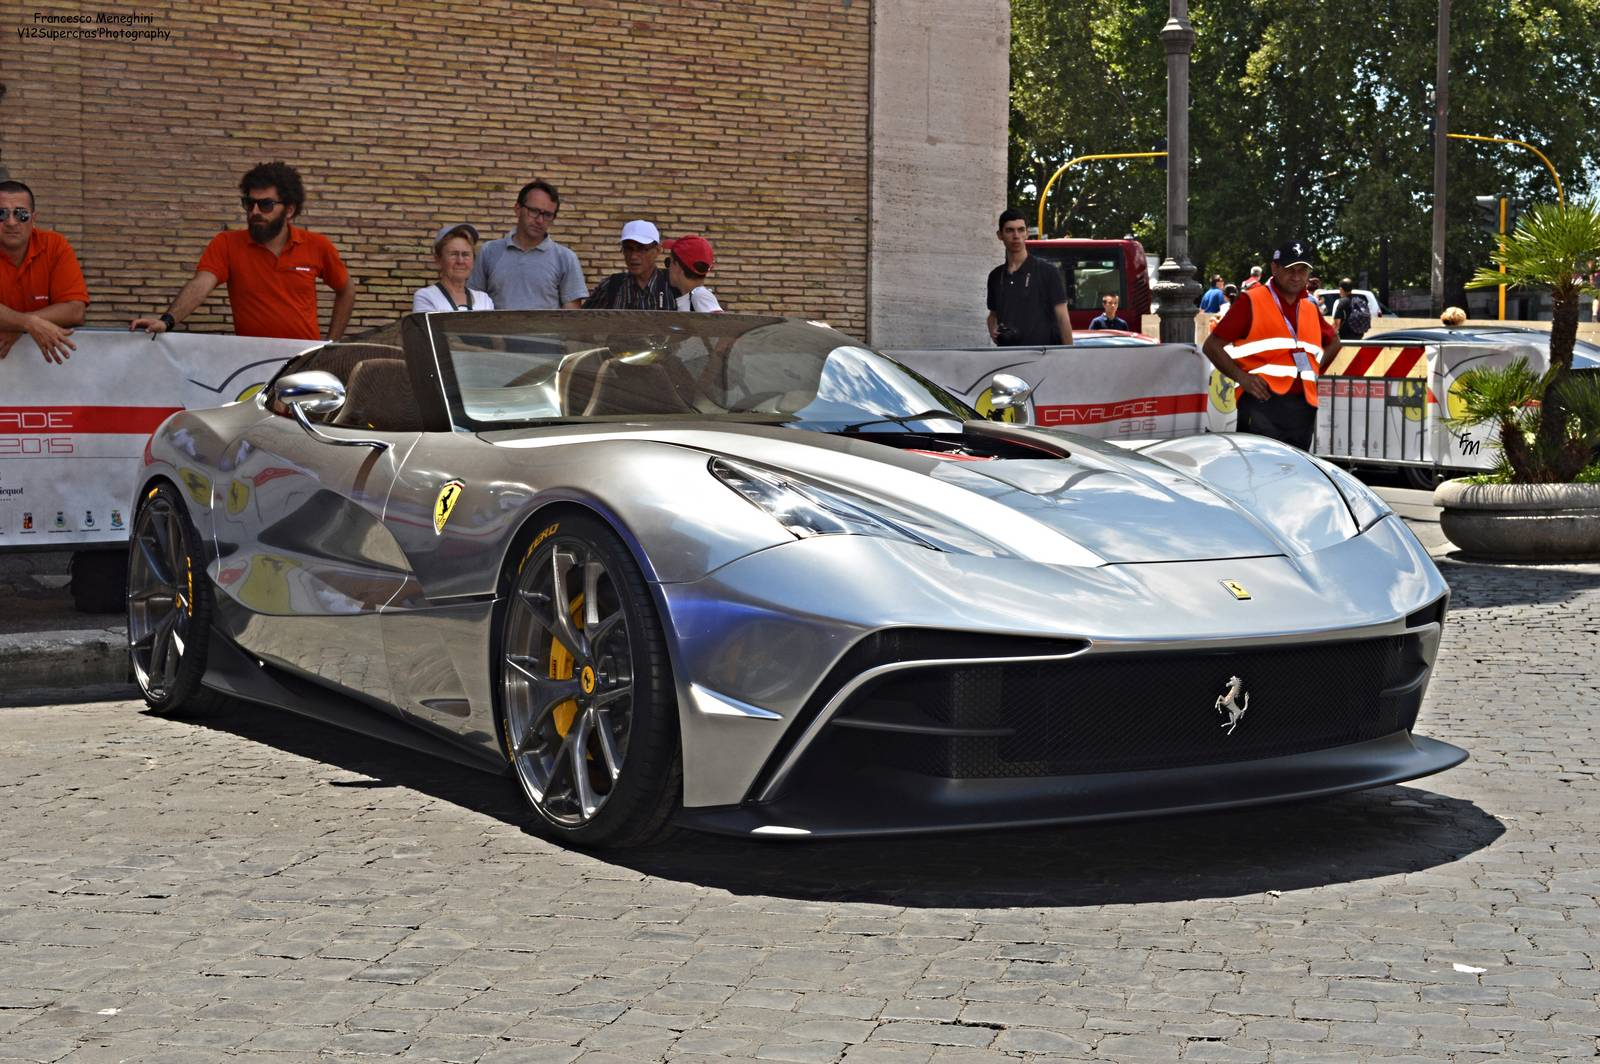 Silver Chrome Ferrari F12 TRS Snapped in Rome , GTspirit